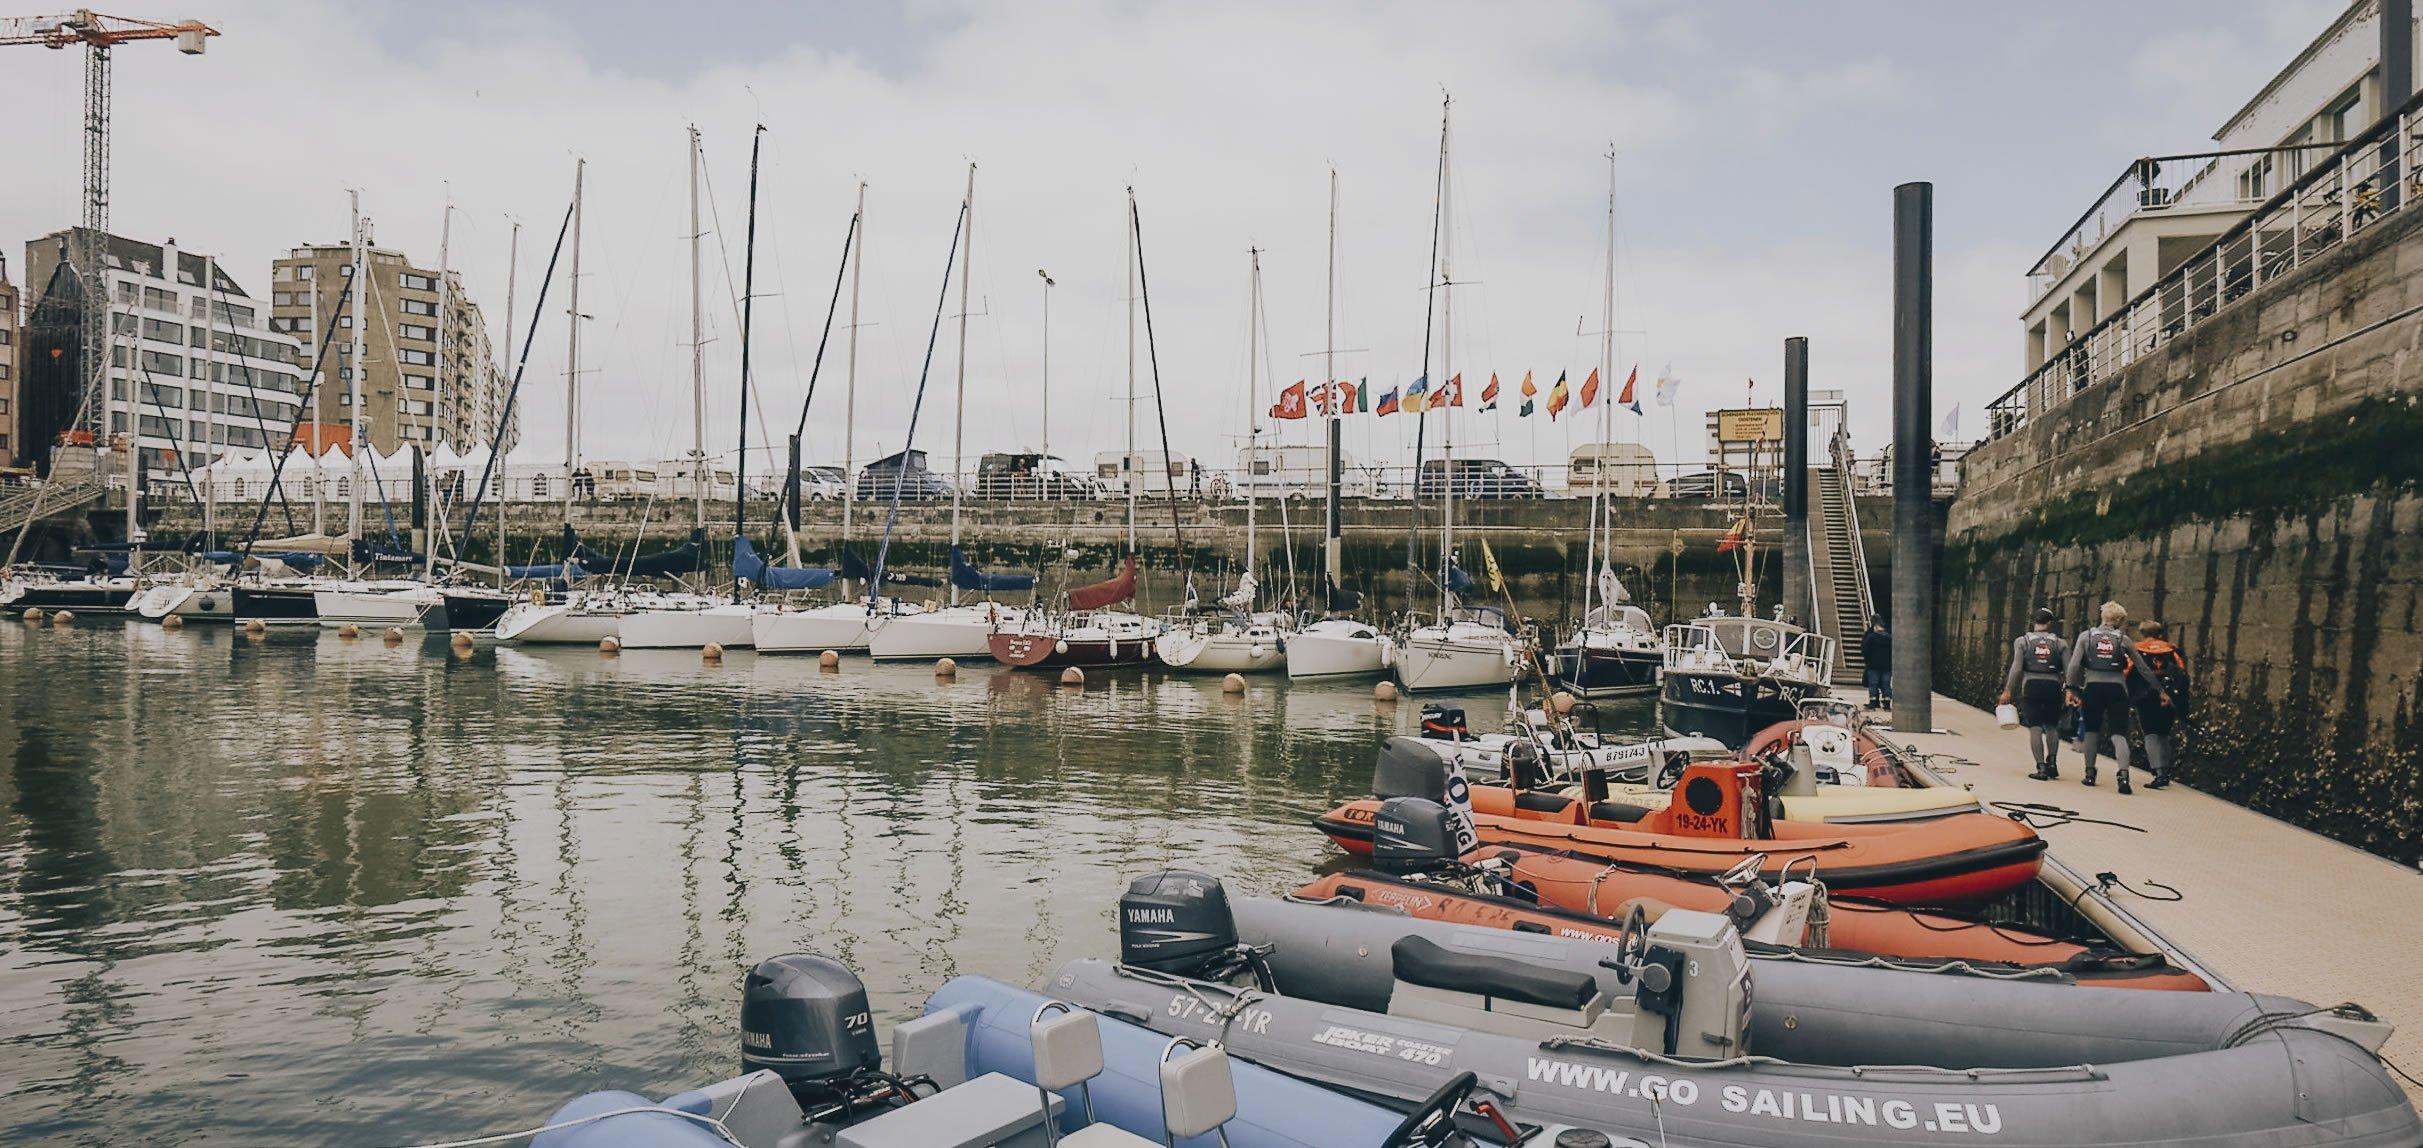 Jachthaven Oostende